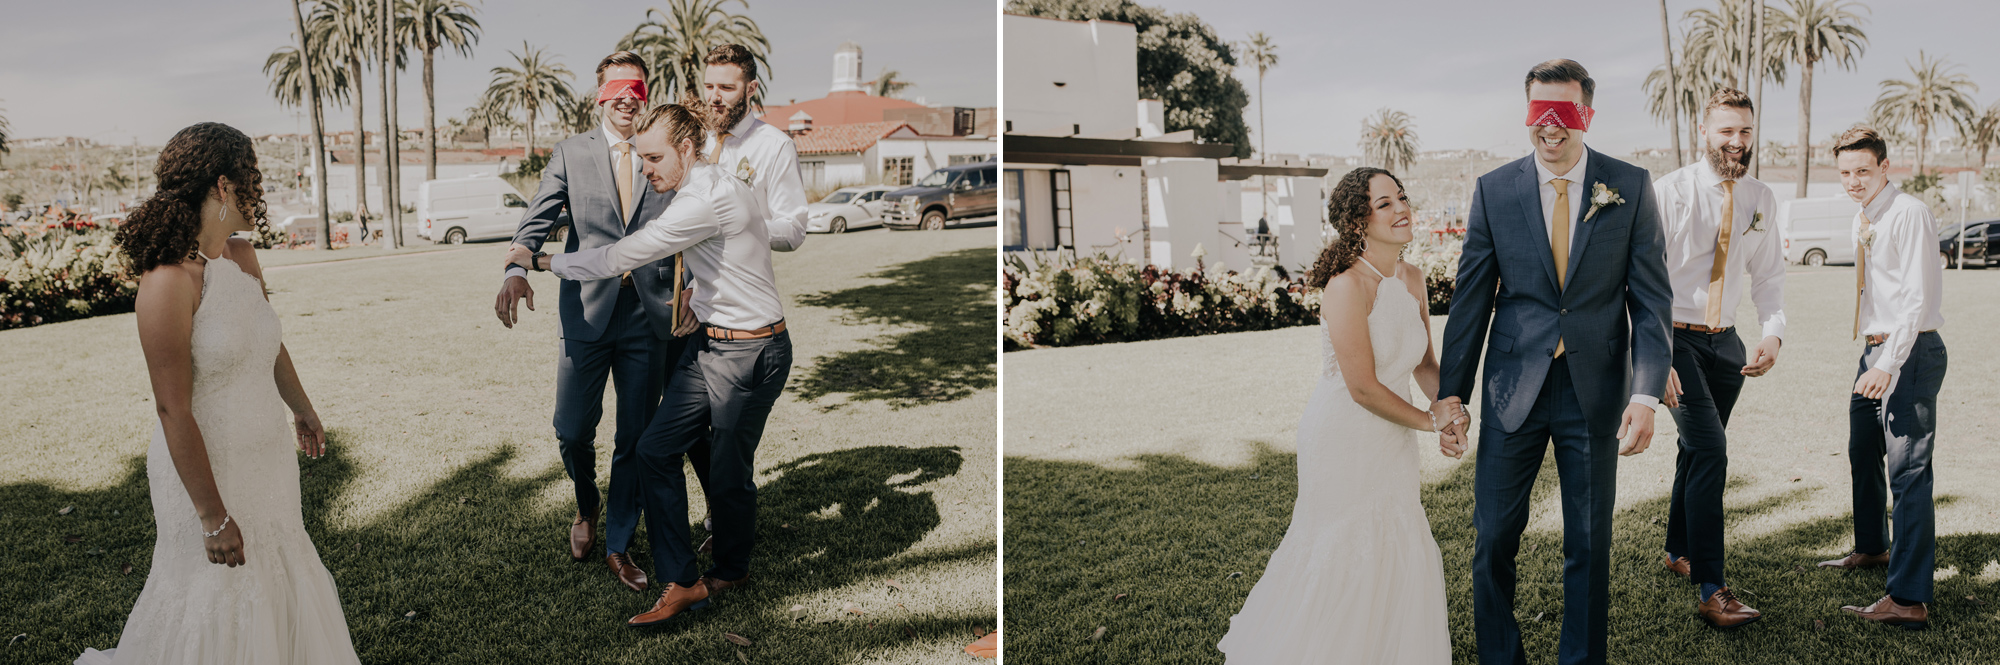 068-destination-wedding-san-clemente-california.jpg